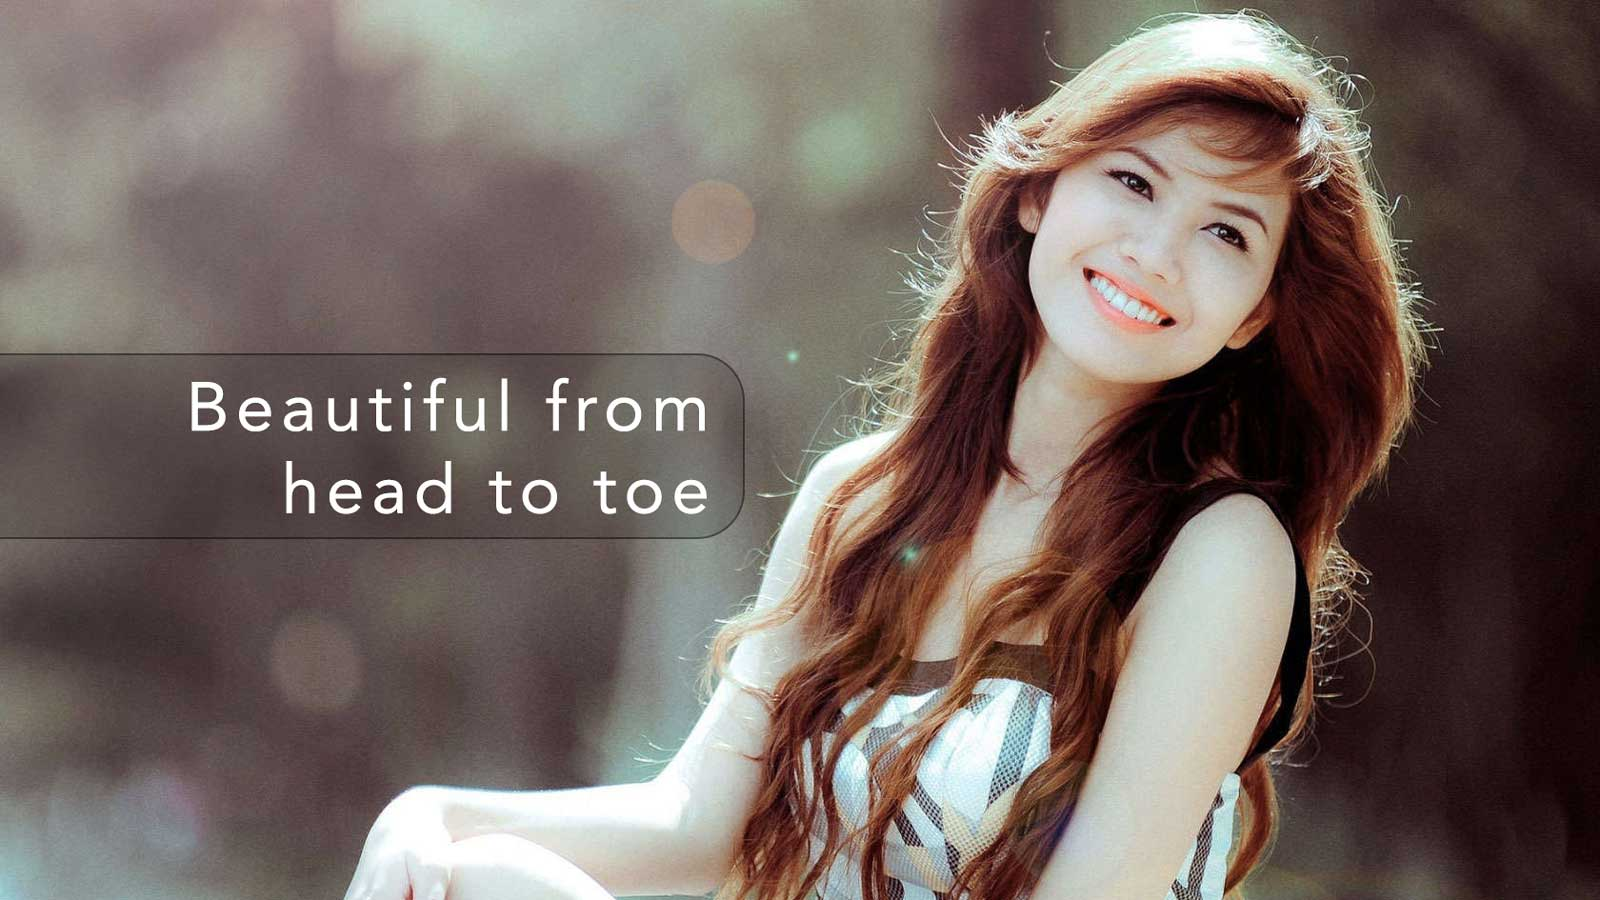 Vitamin C and it's beauty benefits